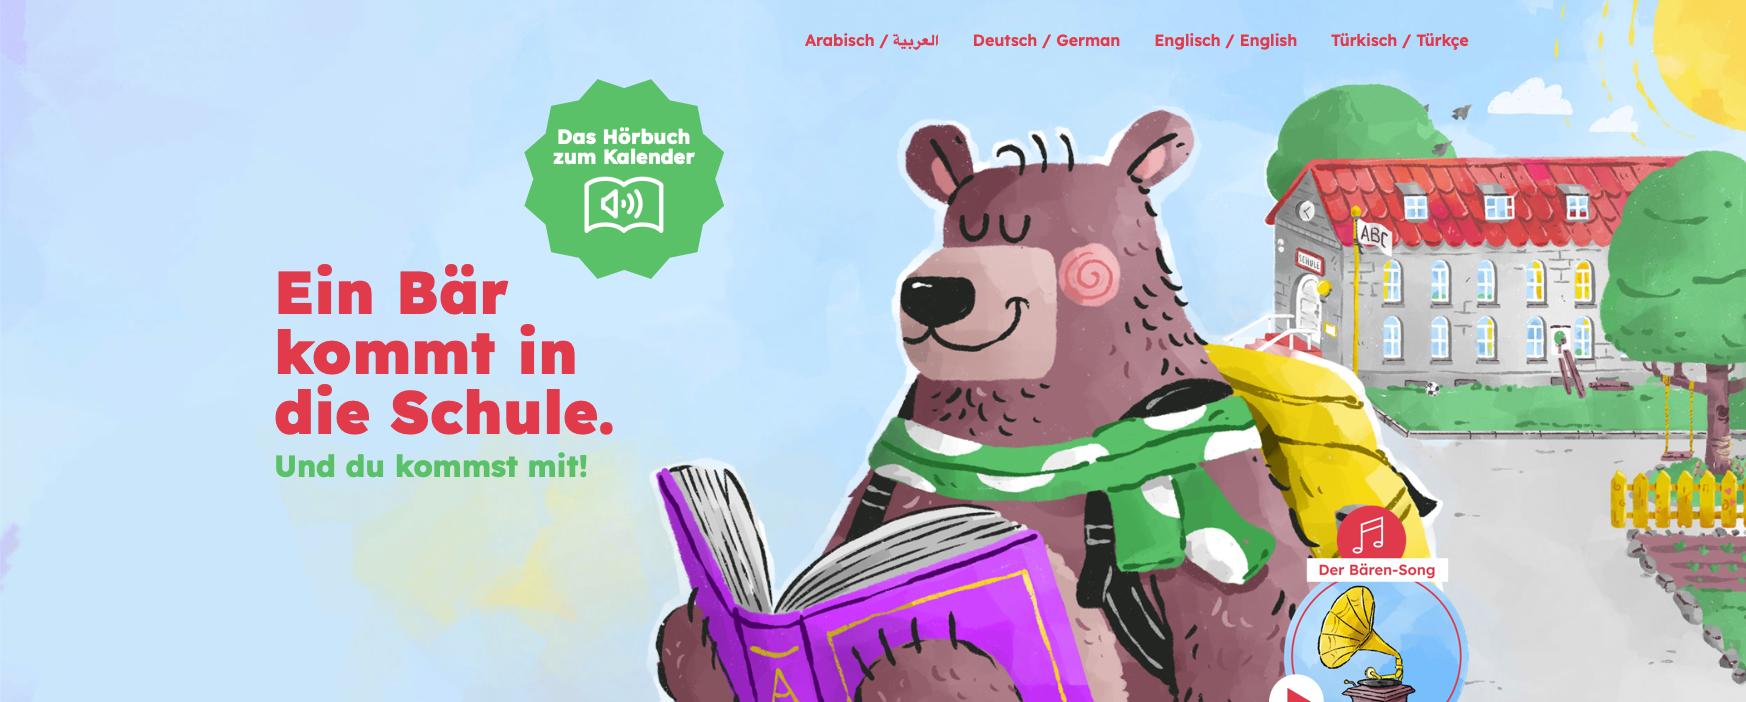 Ein Bär kommt in die Schule